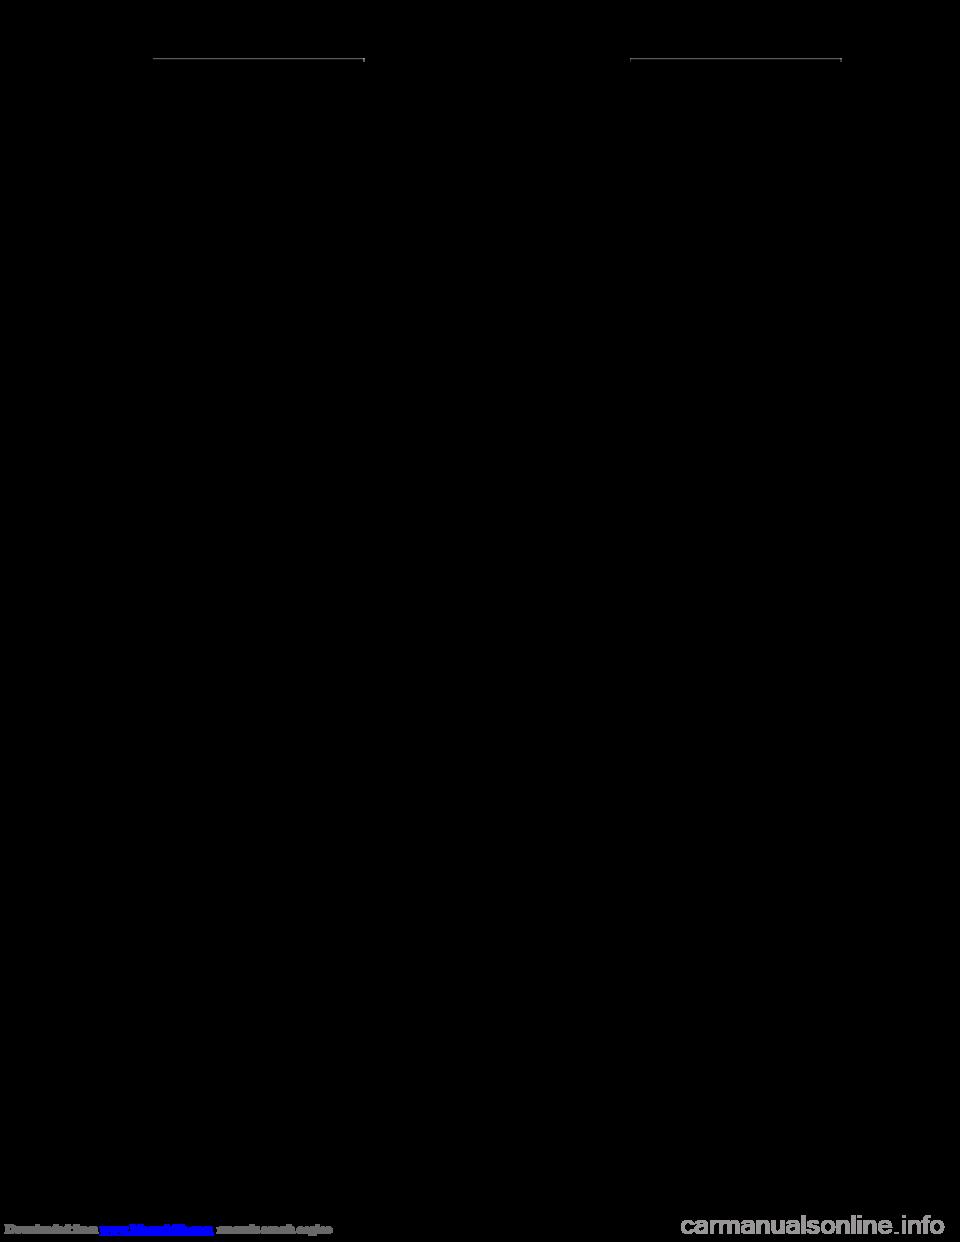 Dodge Neon 1997 1g Wiring Diagrams Workshop Manual Fusible Link Diagram G